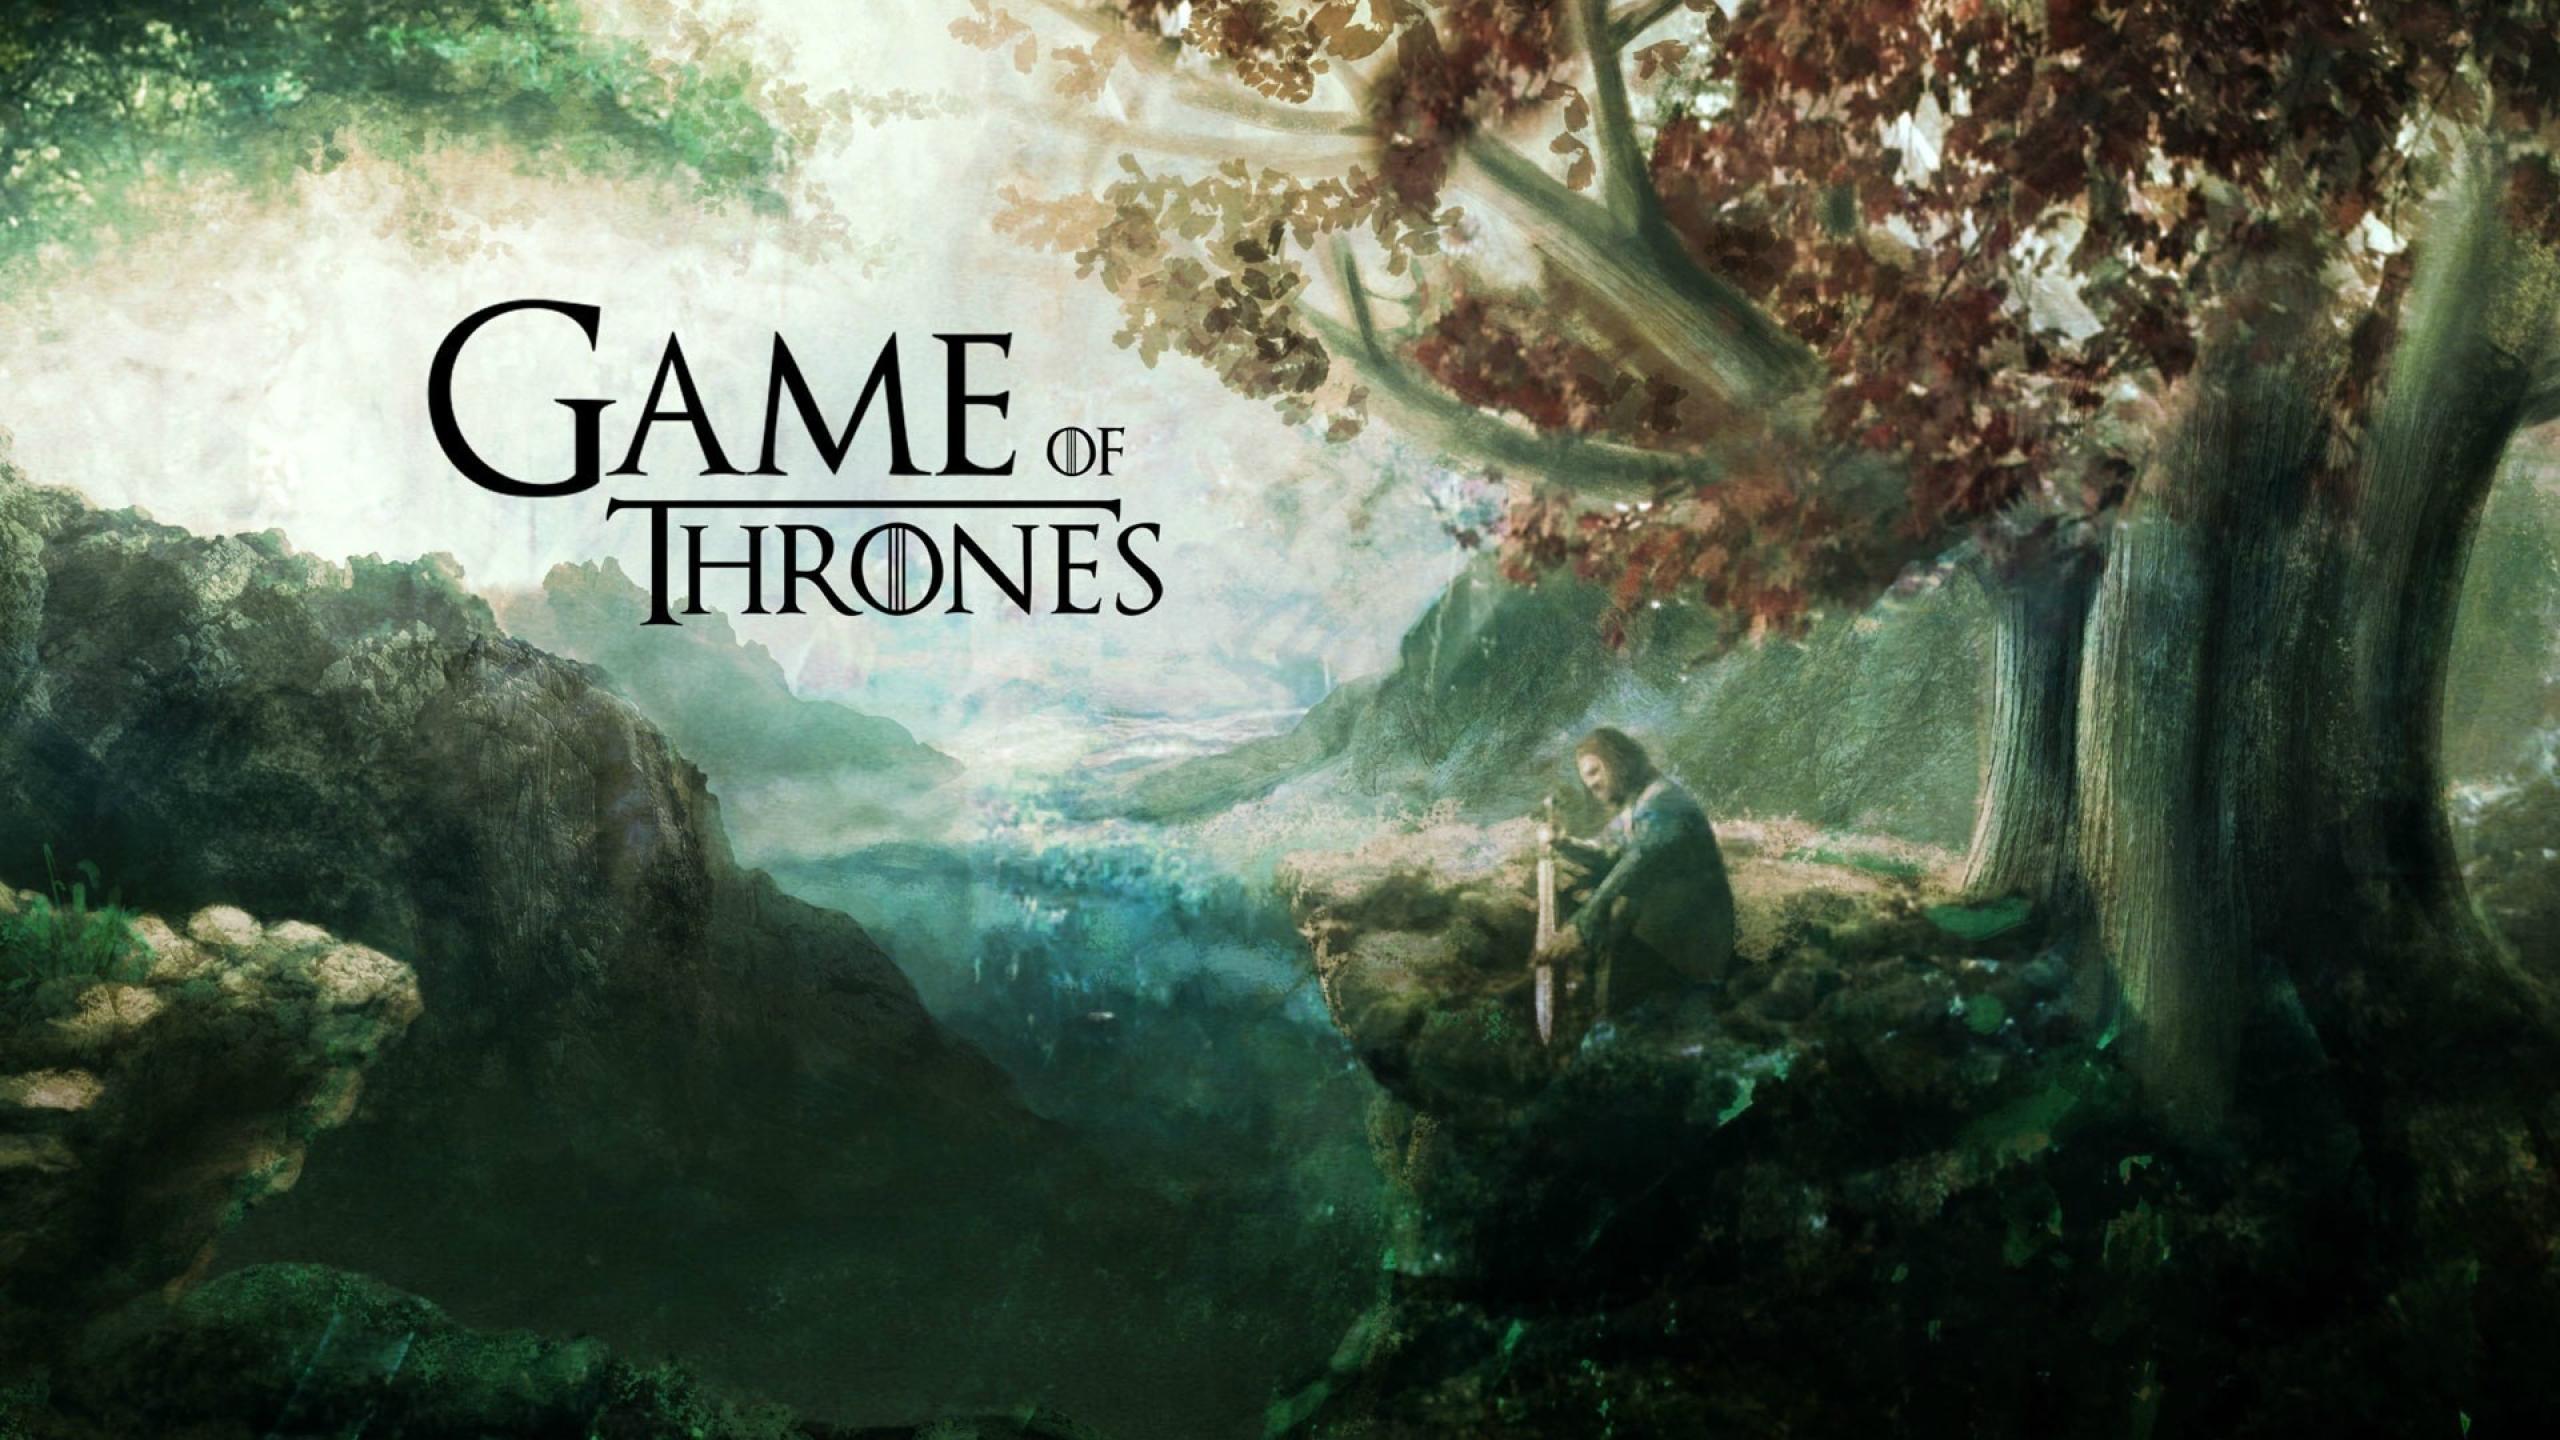 2560x1440 Game Of Thrones Tv Show Banner Wallpaper 1440p